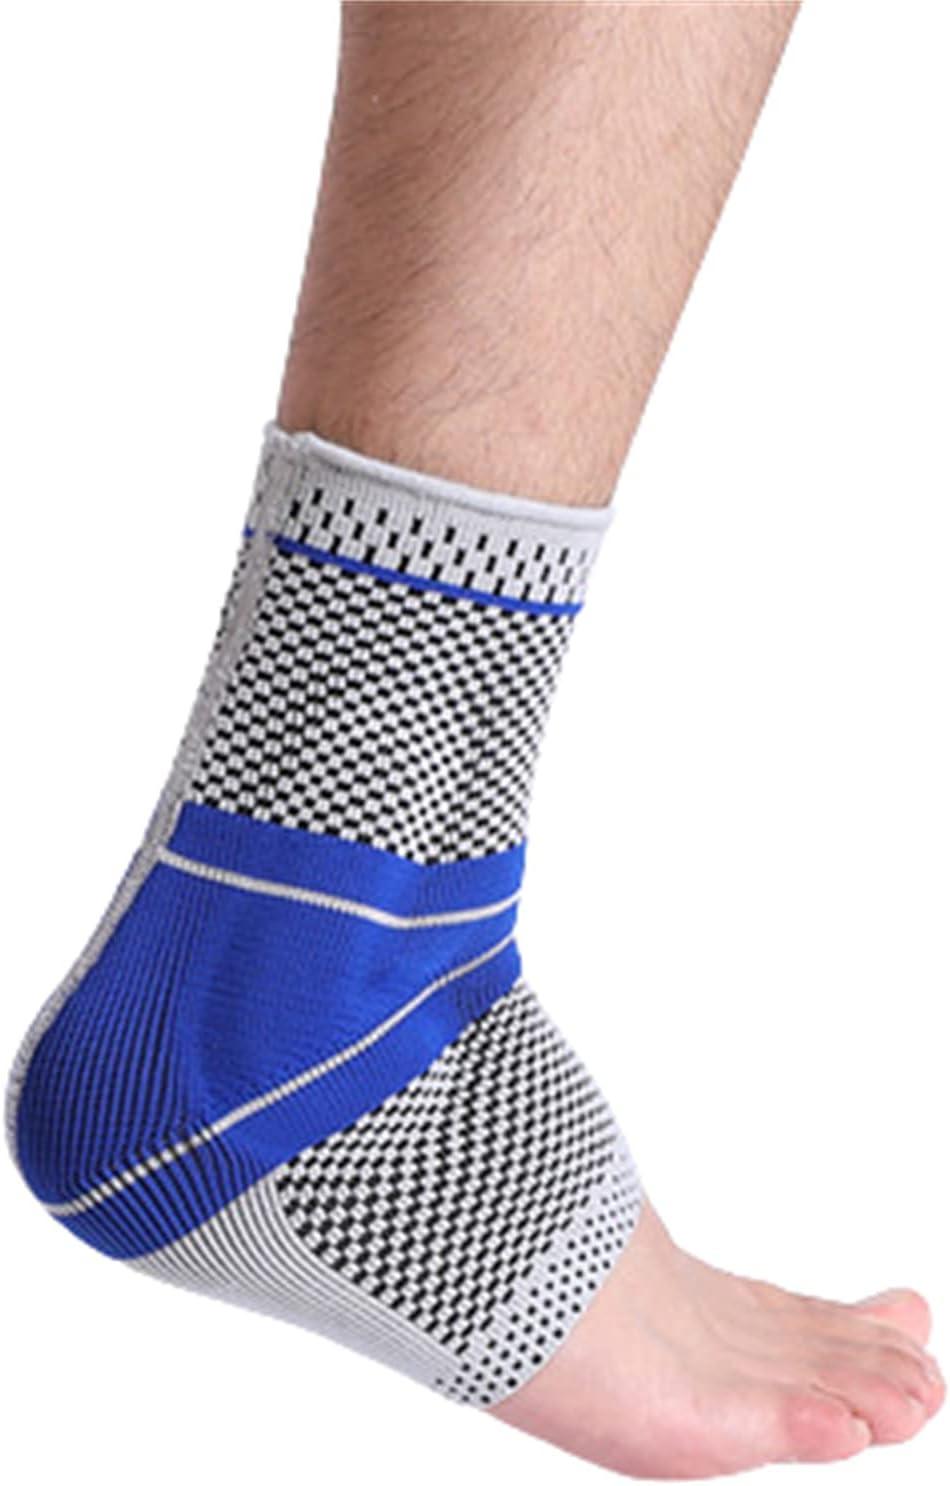 Indefinitely JJWCD Sale Plantar Fasciitis Compression Socks Best Sleeve Nano Ankle